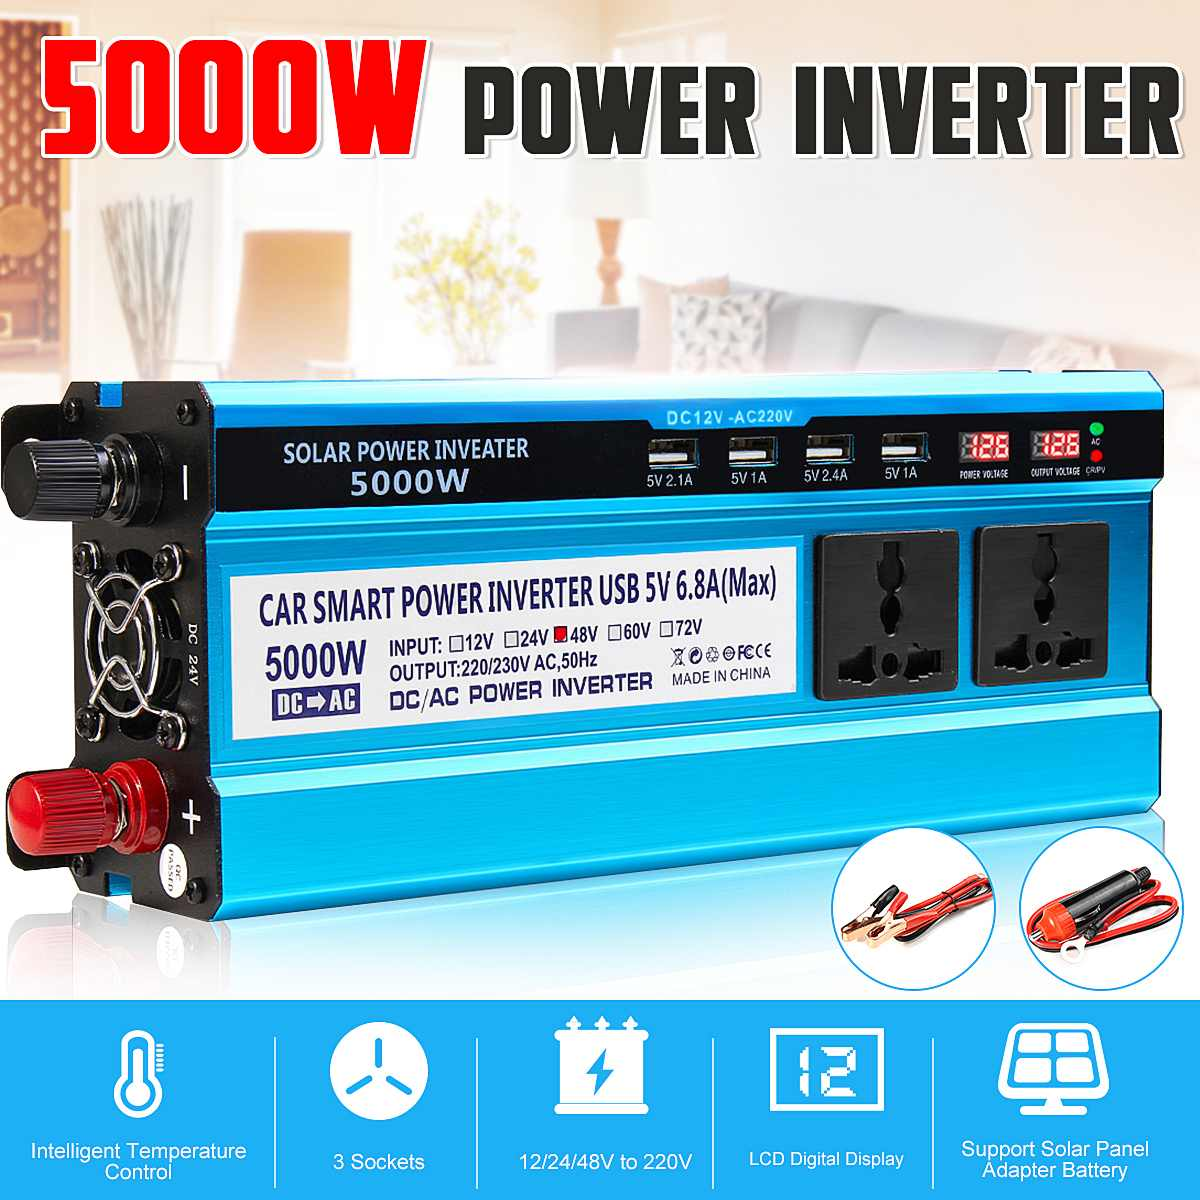 5000W Solar Power Inverter DC 12V/24V/48V To AC 220V Voltage Converter Transformer Double Display 3 Sockets 4 USB Ports